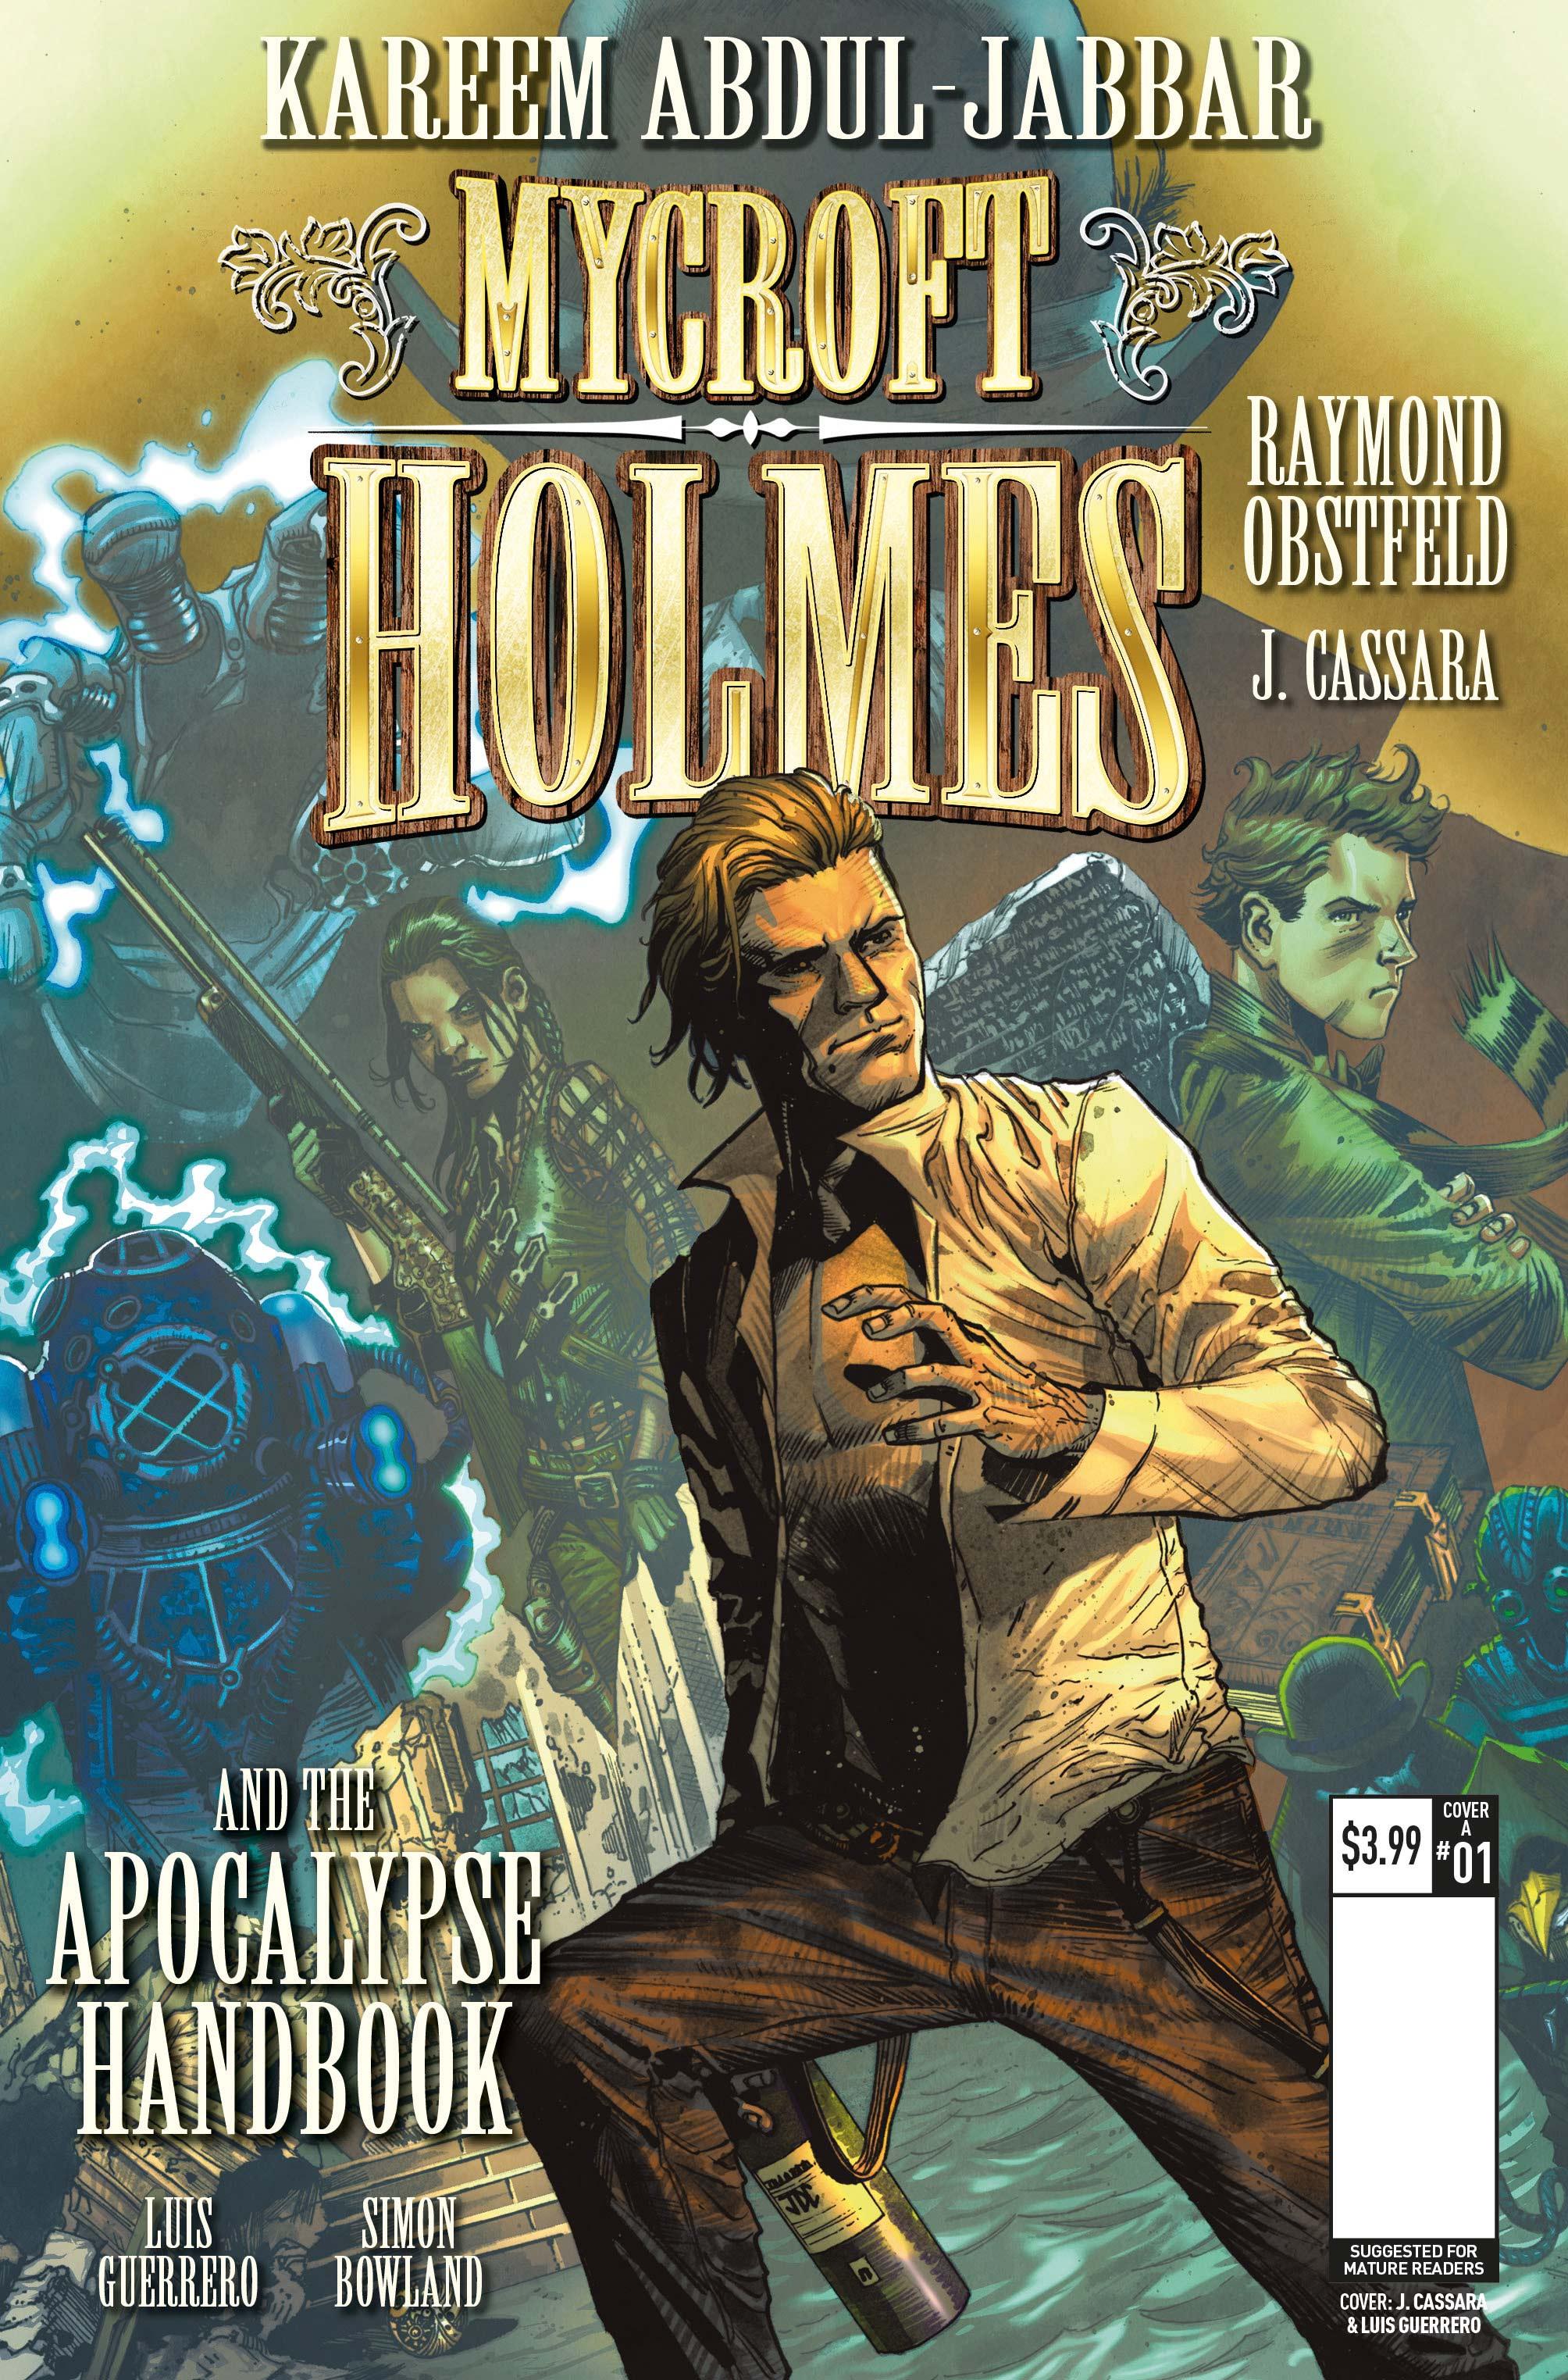 mycroft holmes the apocalypse handbook hq kareem abdul jabbar joshua cassara luis guerrero raymond obstfeld (5)